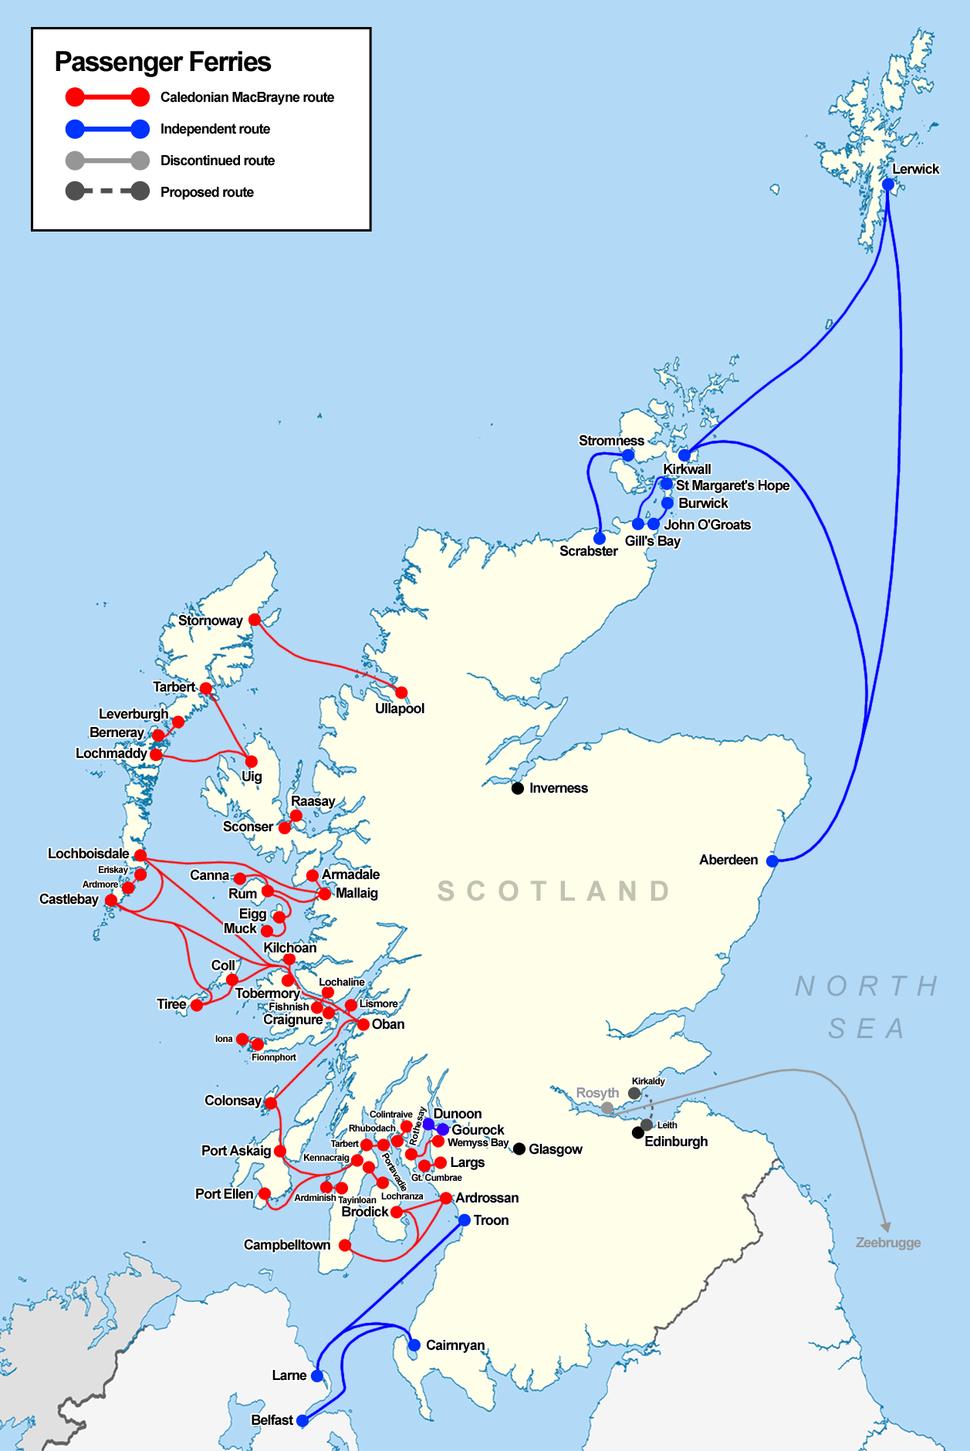 Scotland ferries map